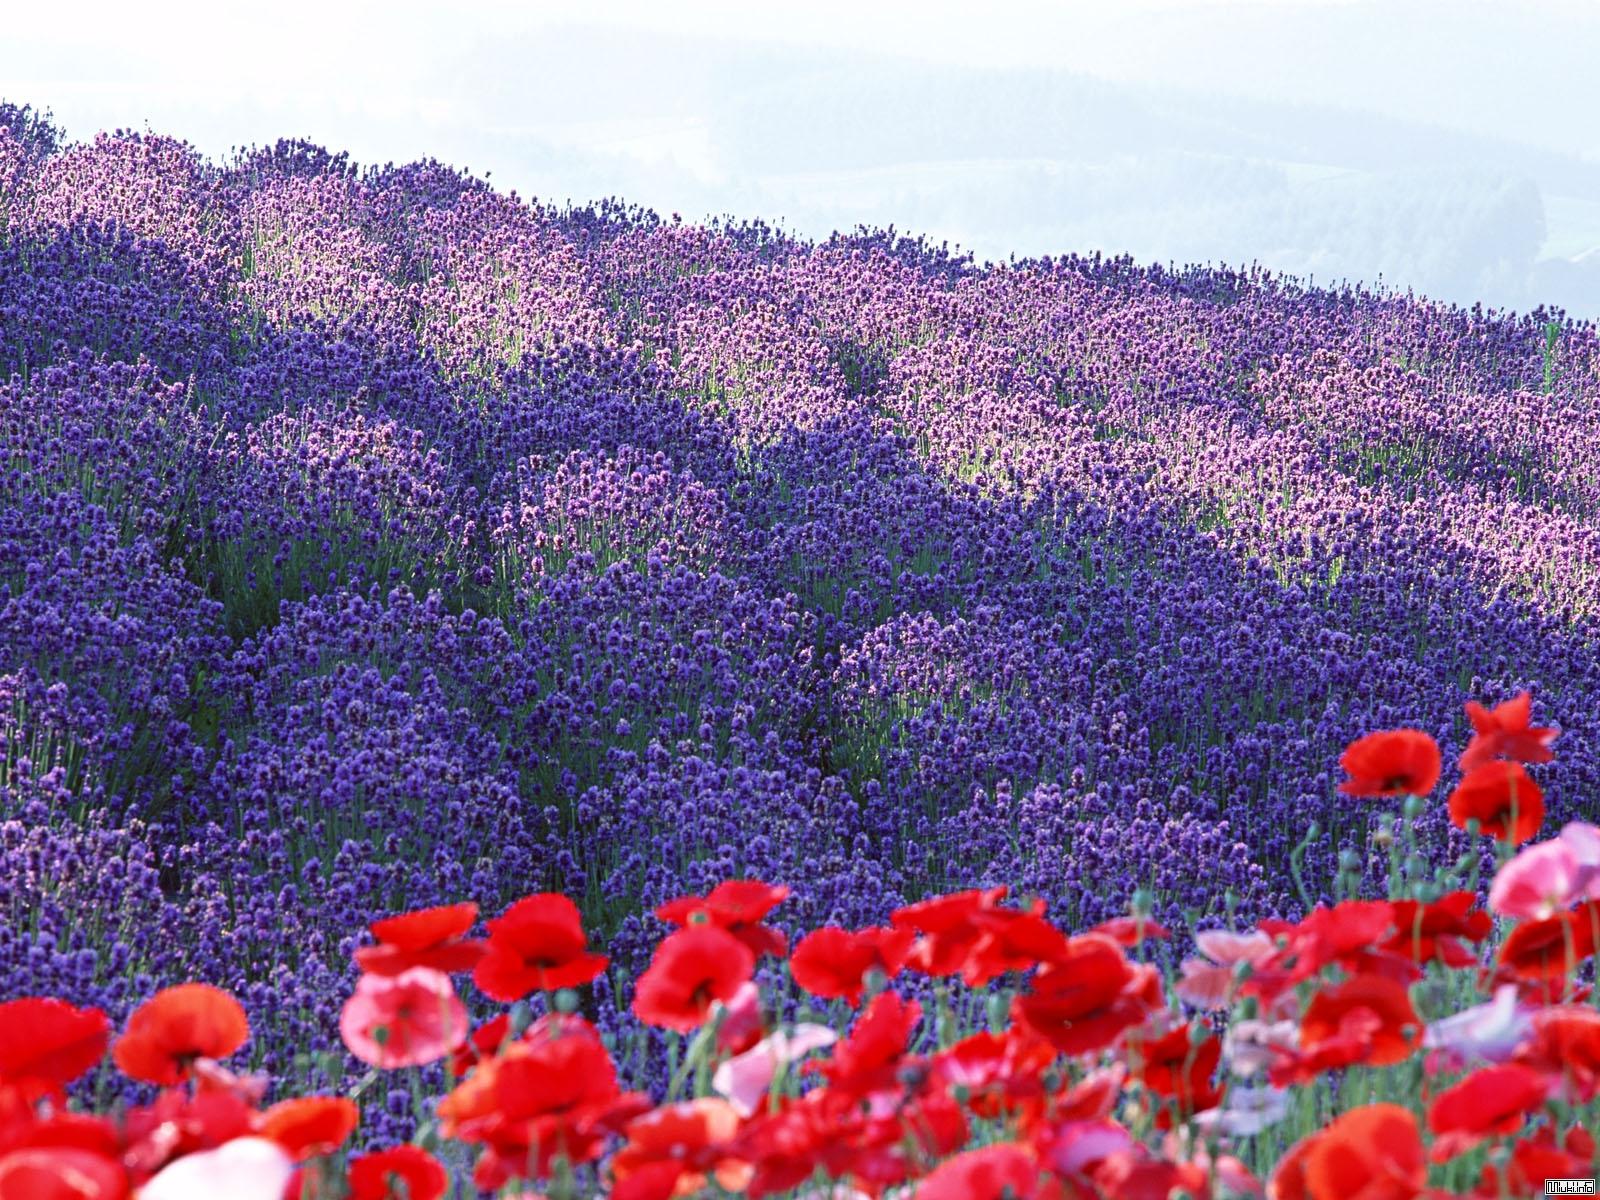 Кисэцукан. Японское чувство сезонности. Времена года